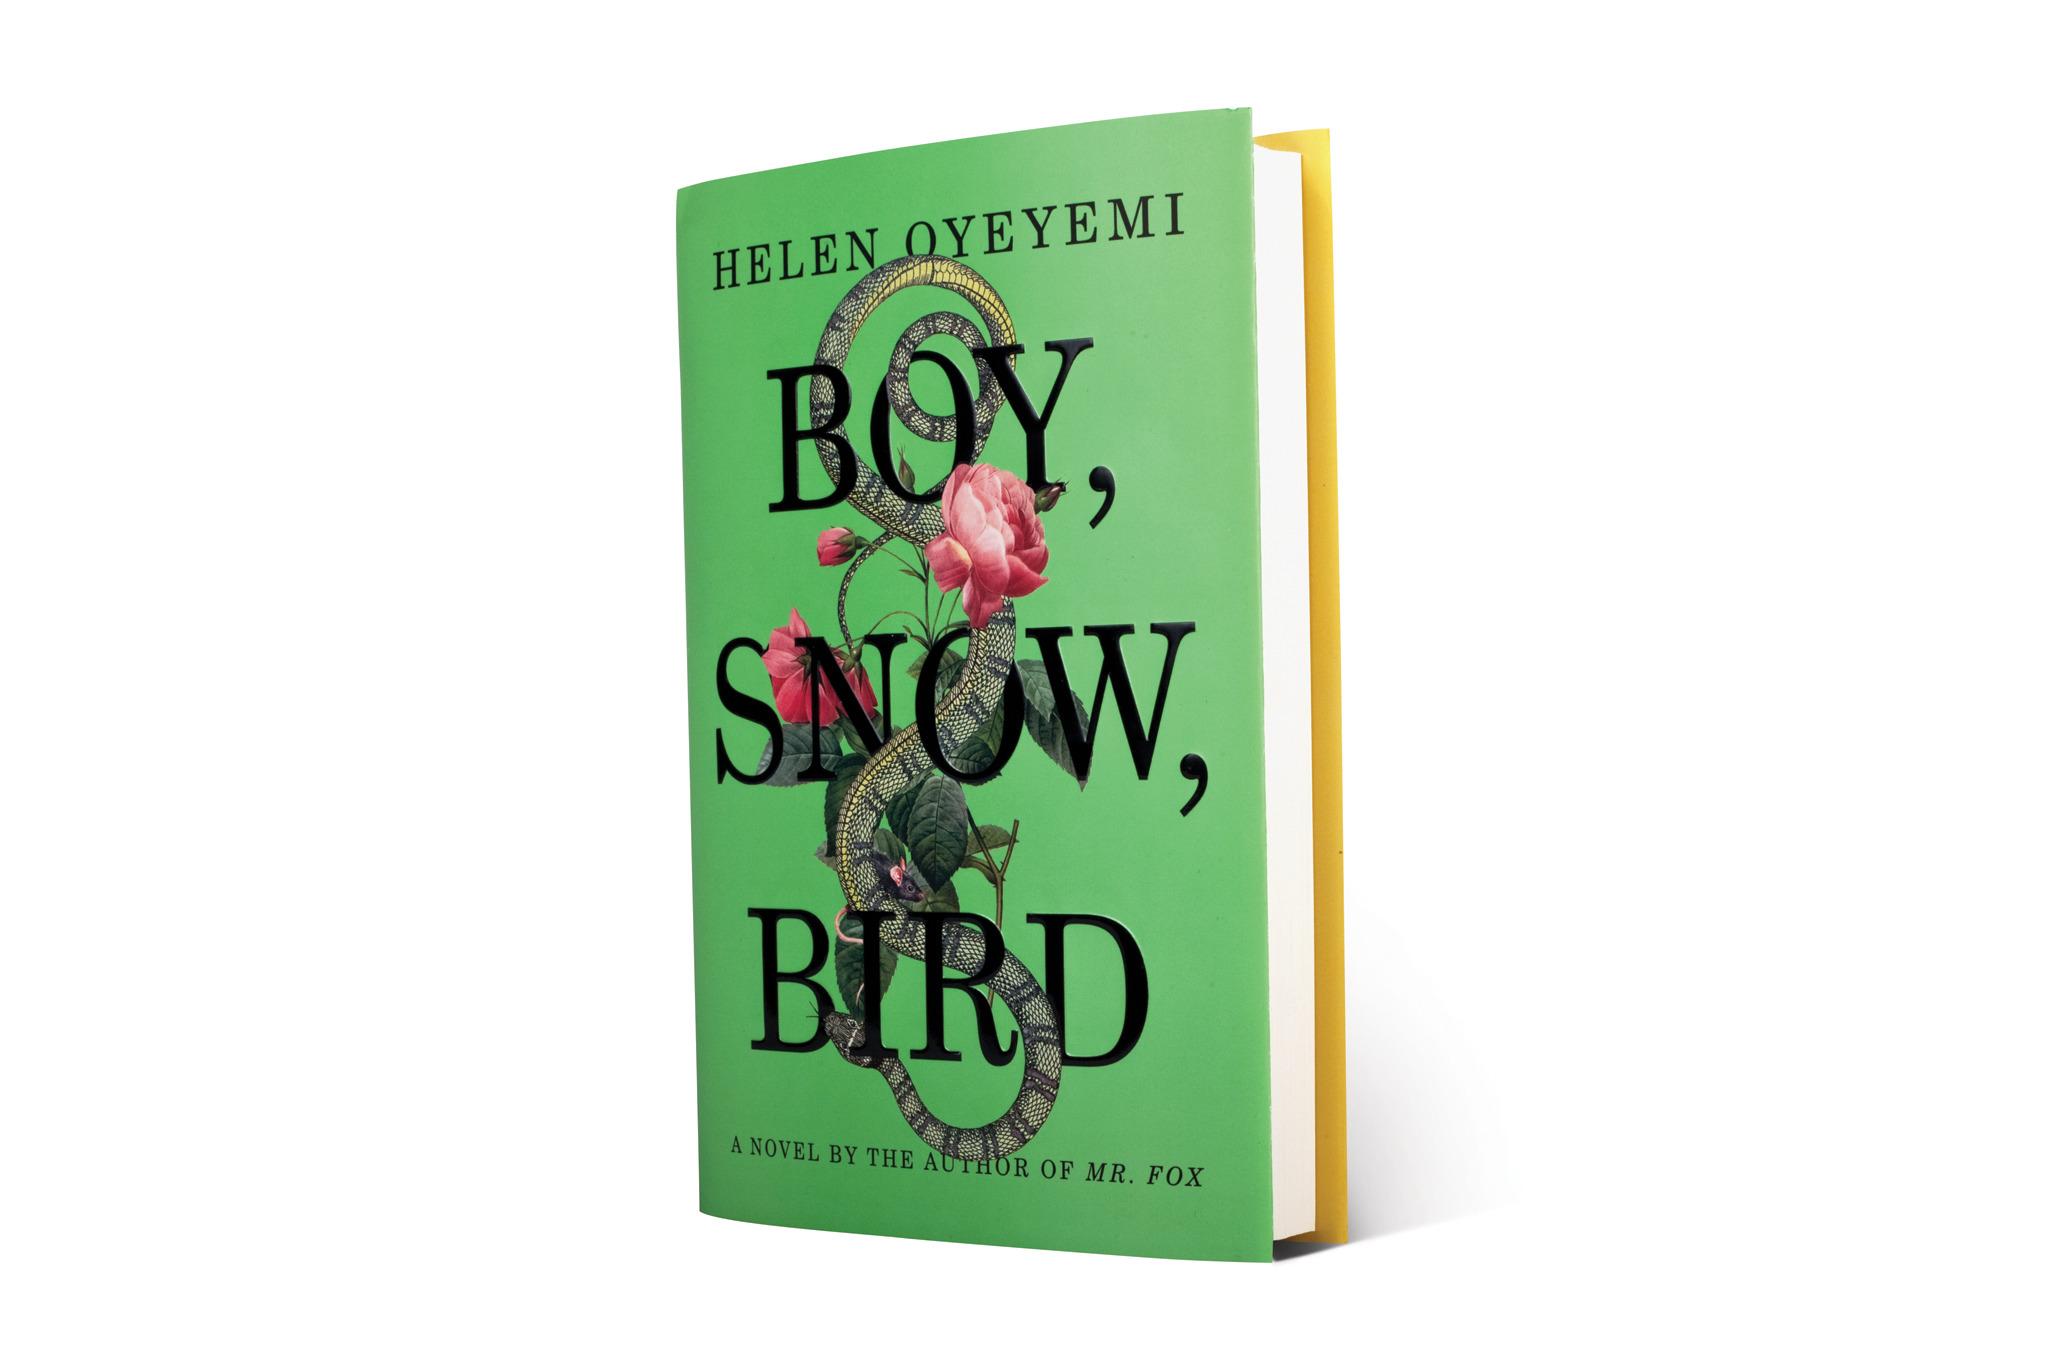 Boy, Snow, Bird by Helen Oyeyemi